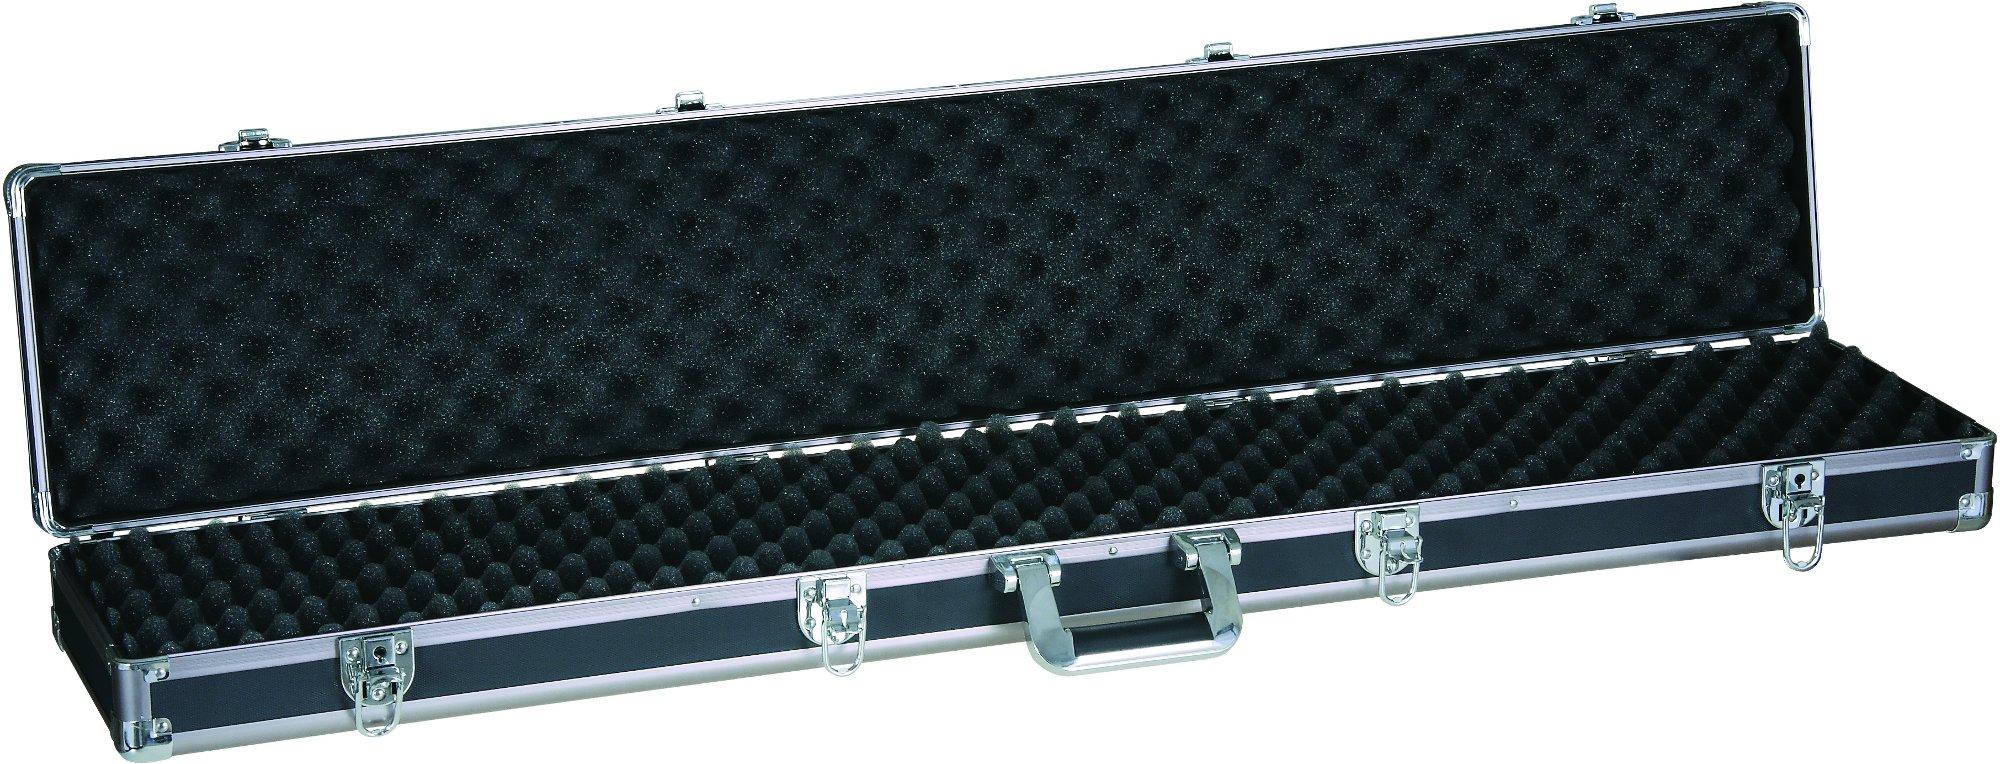 vanguard waffenkoffer schwarz 124 5x23x11 5 cm classic 62cl koffer rucks cke. Black Bedroom Furniture Sets. Home Design Ideas